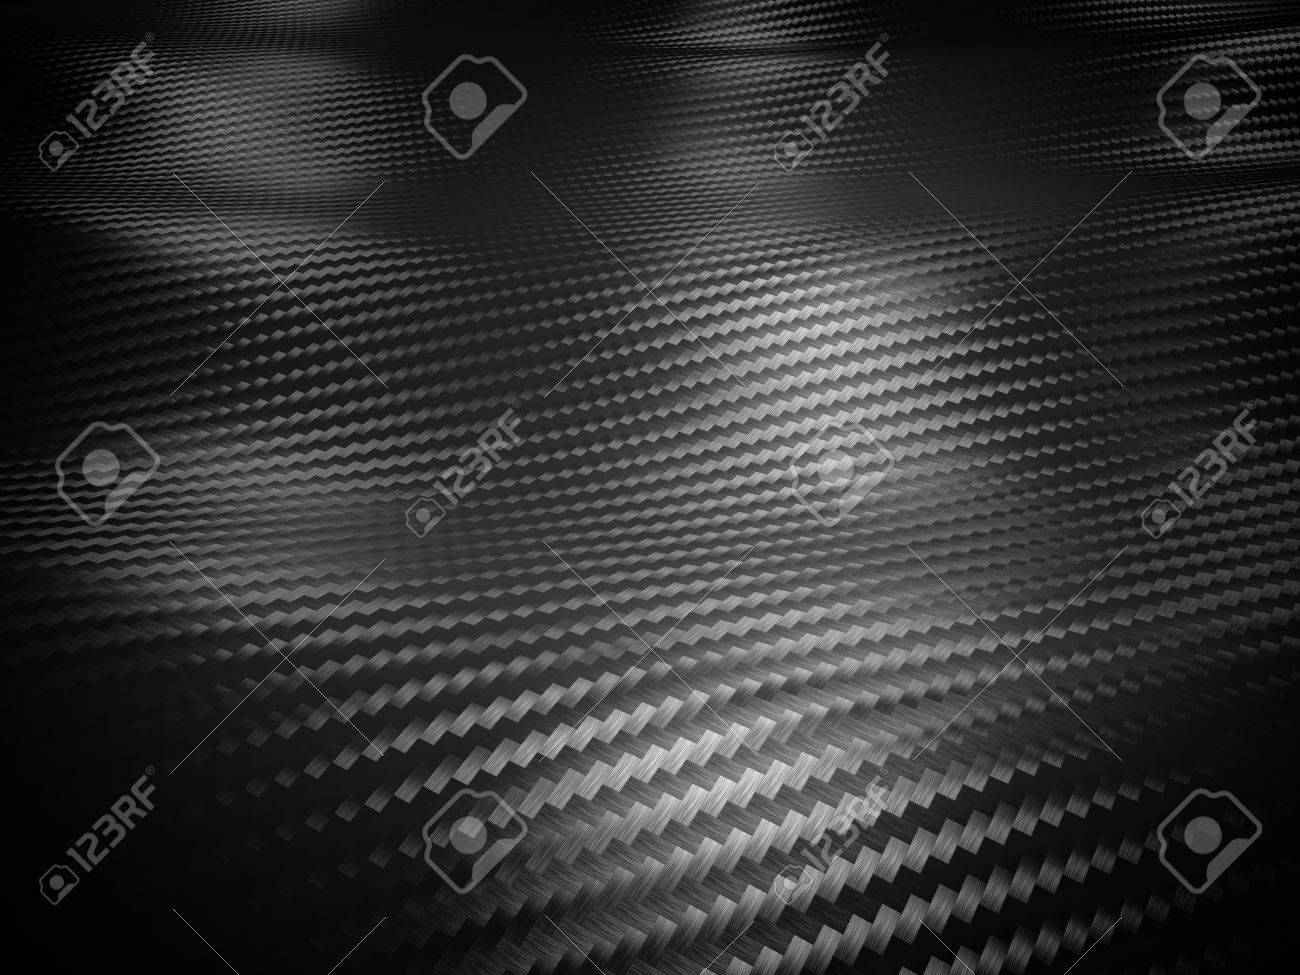 carbon fiber background 3d image - 54721495